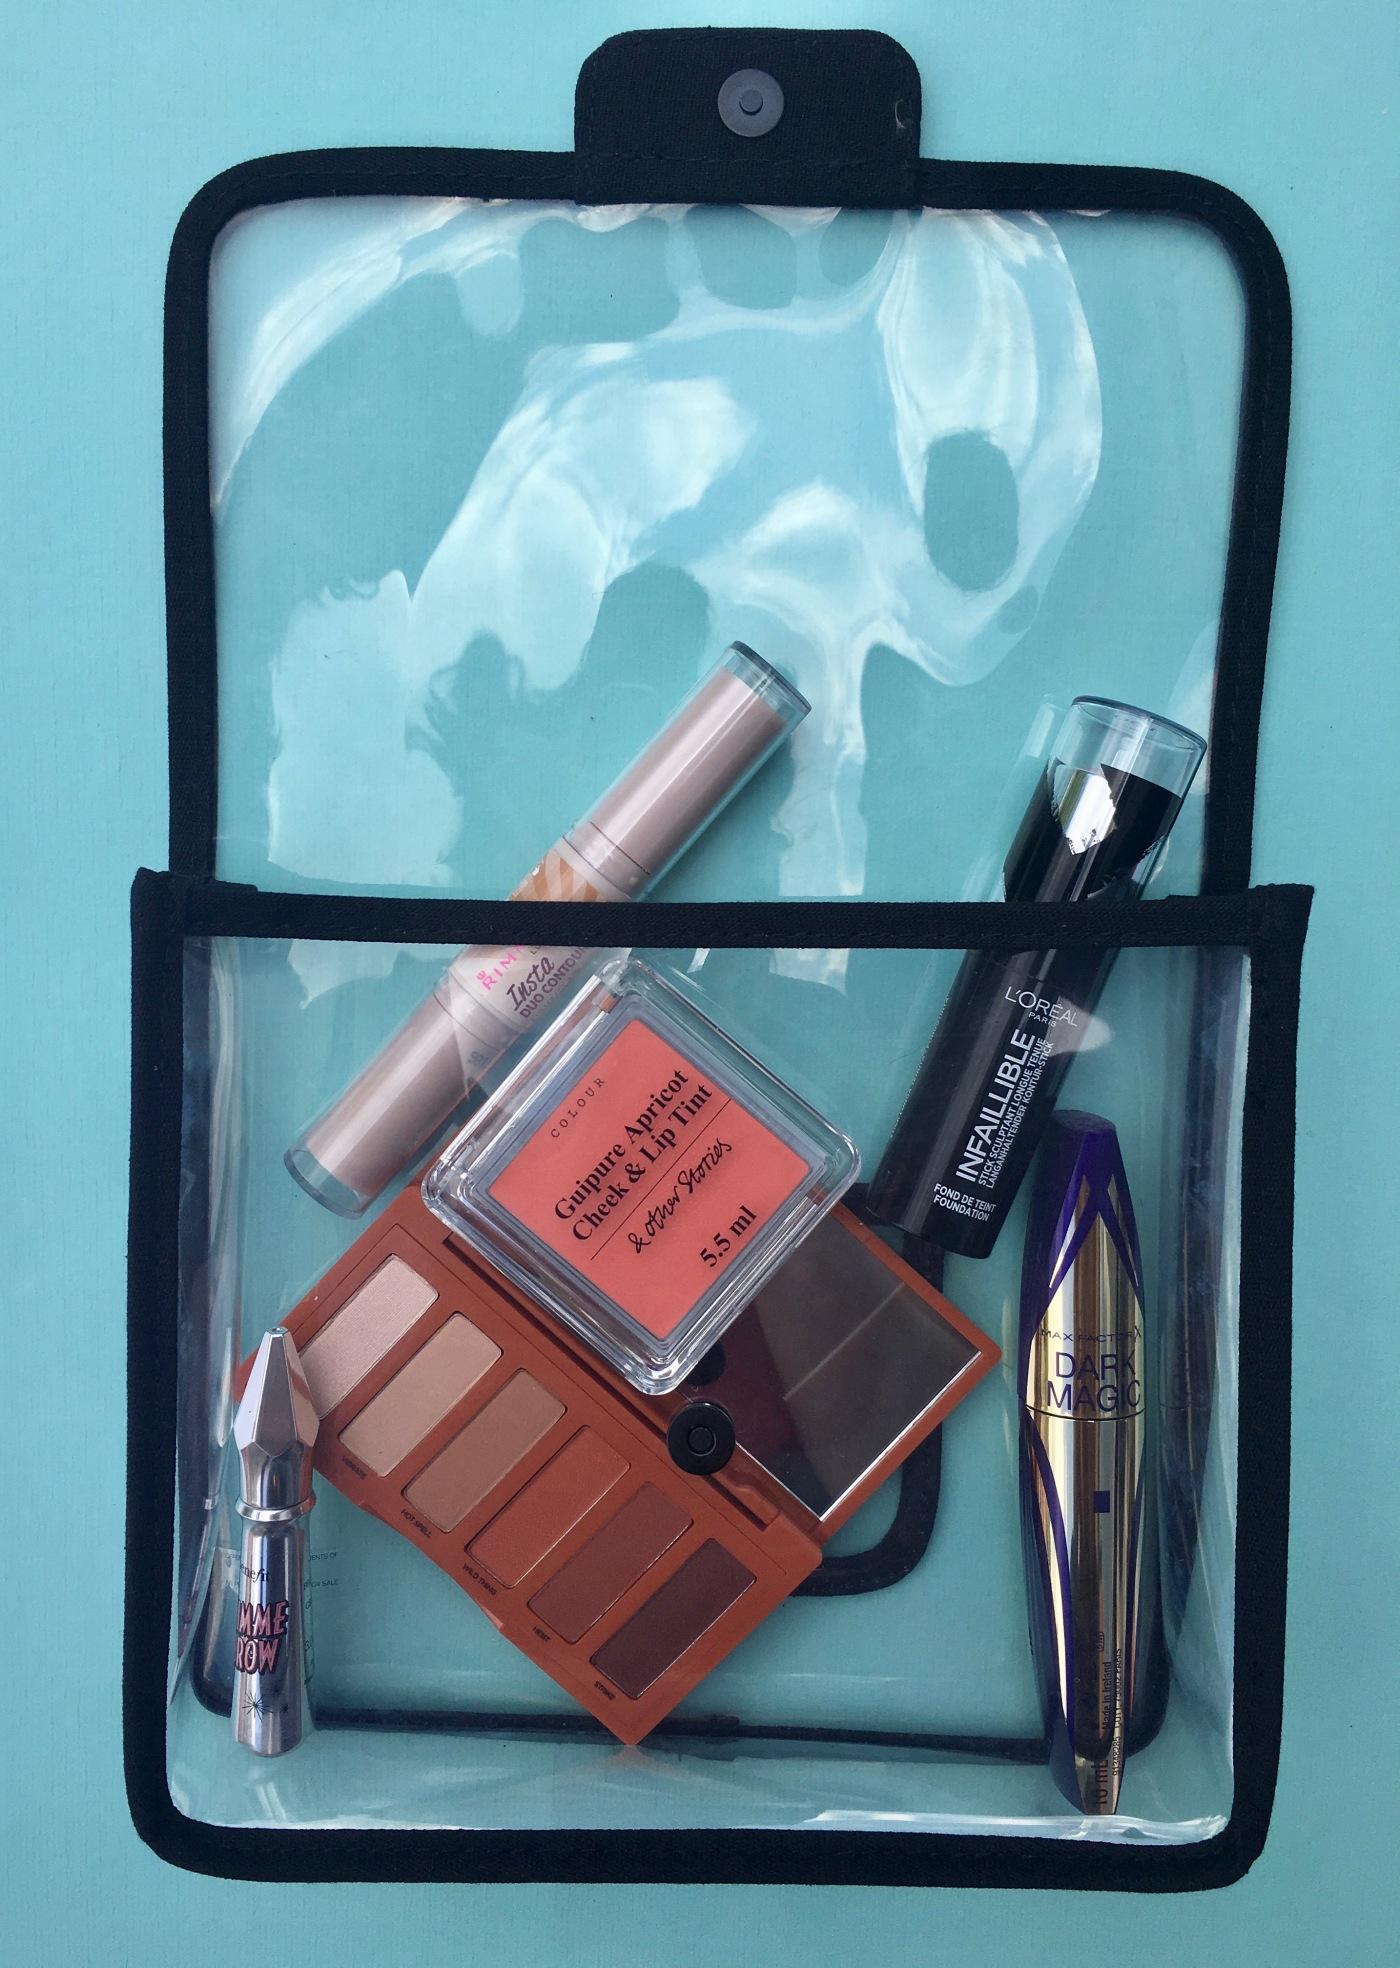 urban decay heat mini gimme brow benefit rommel london infaillible foundation L'Oréal paris dark magic mascara max factor